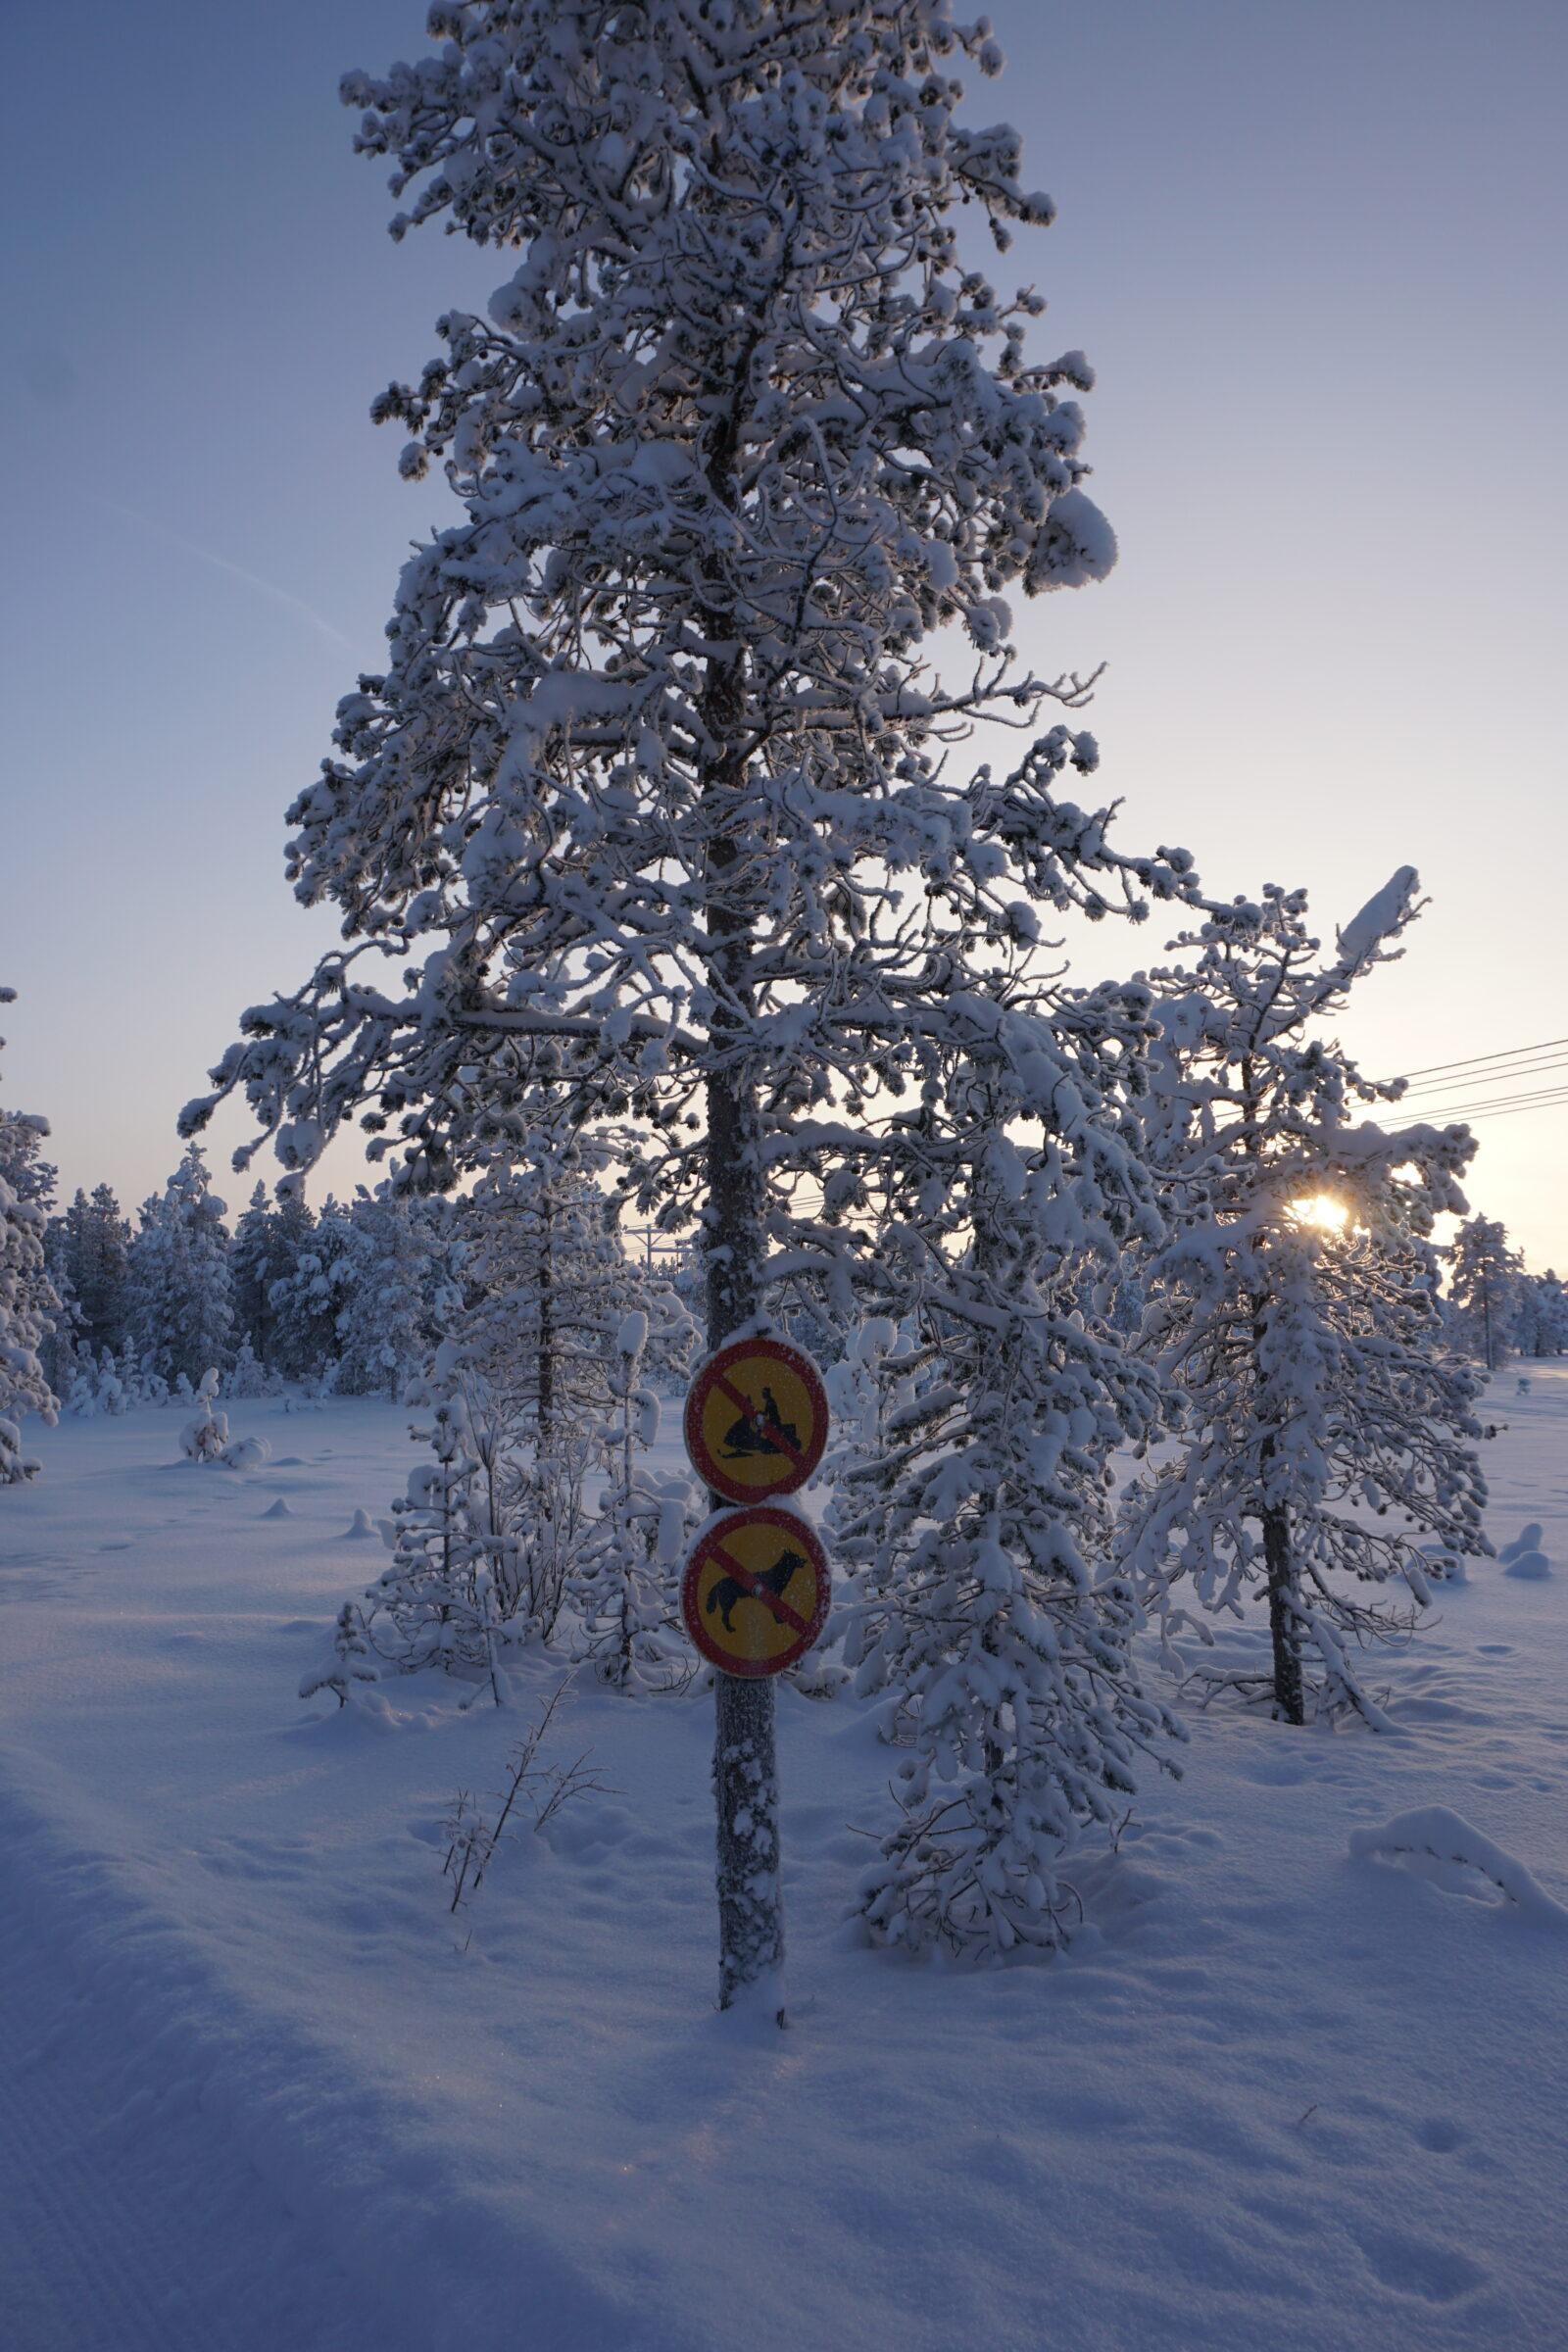 Kittilä Finland, Feb 2019